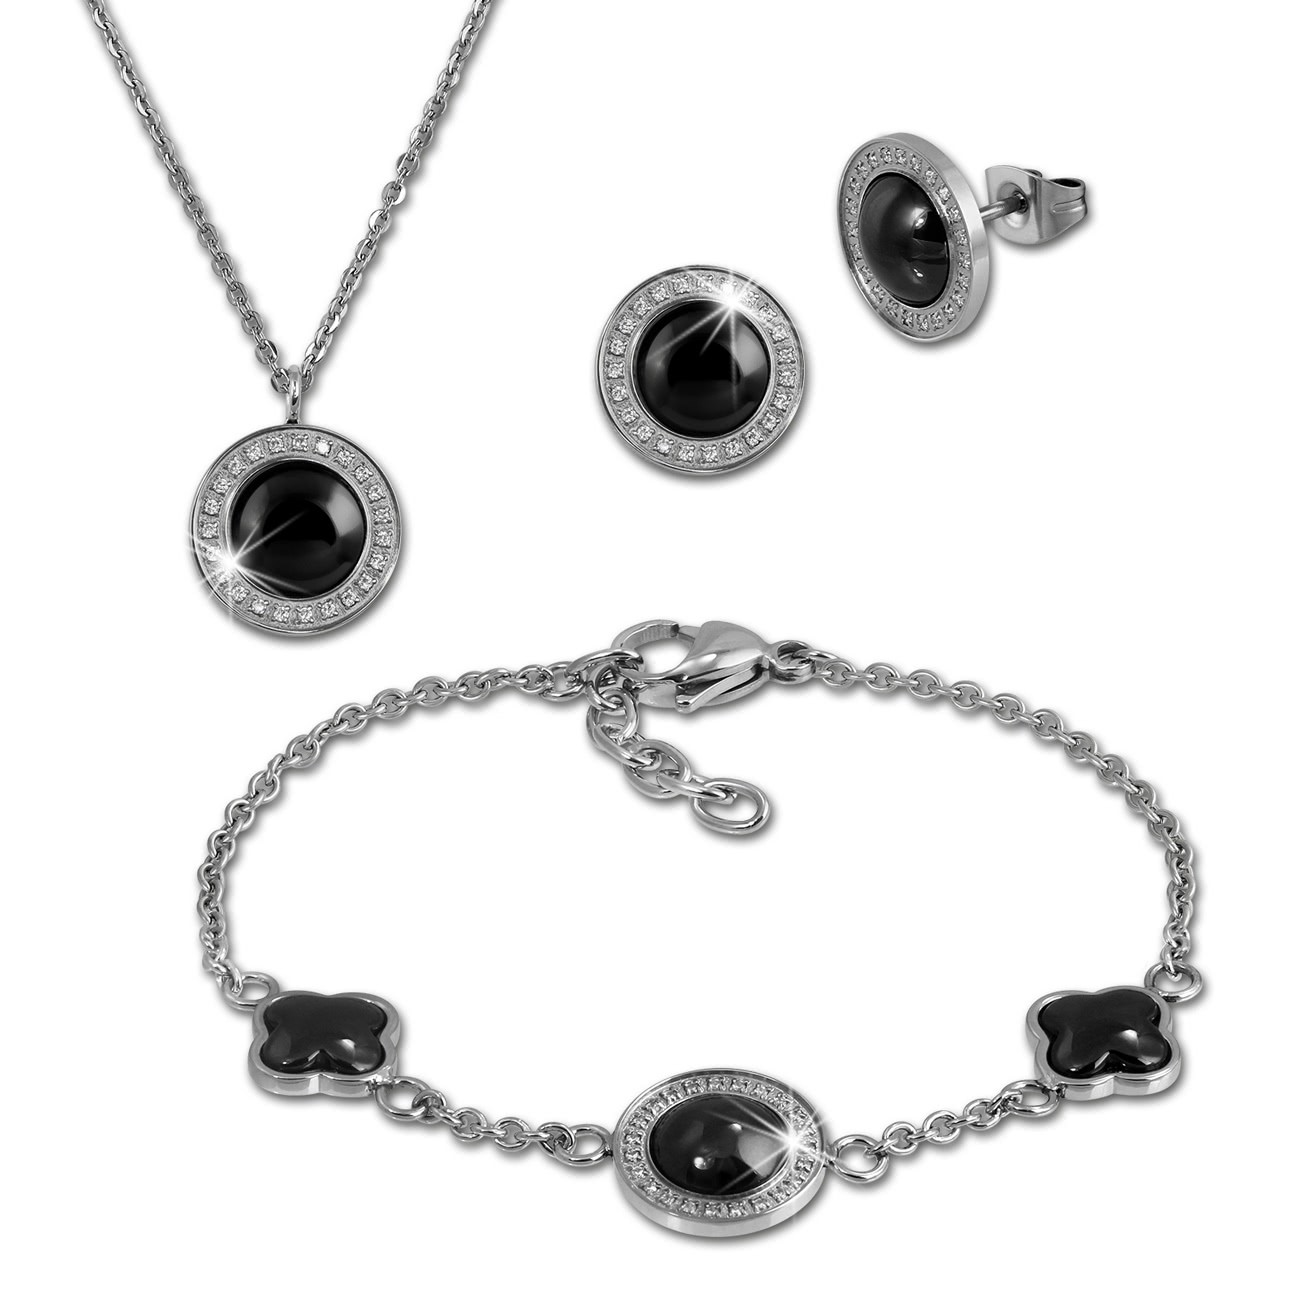 Amello Edelstahlschmuckset Keramik Rund Zirkonia Kette, Armband, Ohrring ESSX30S